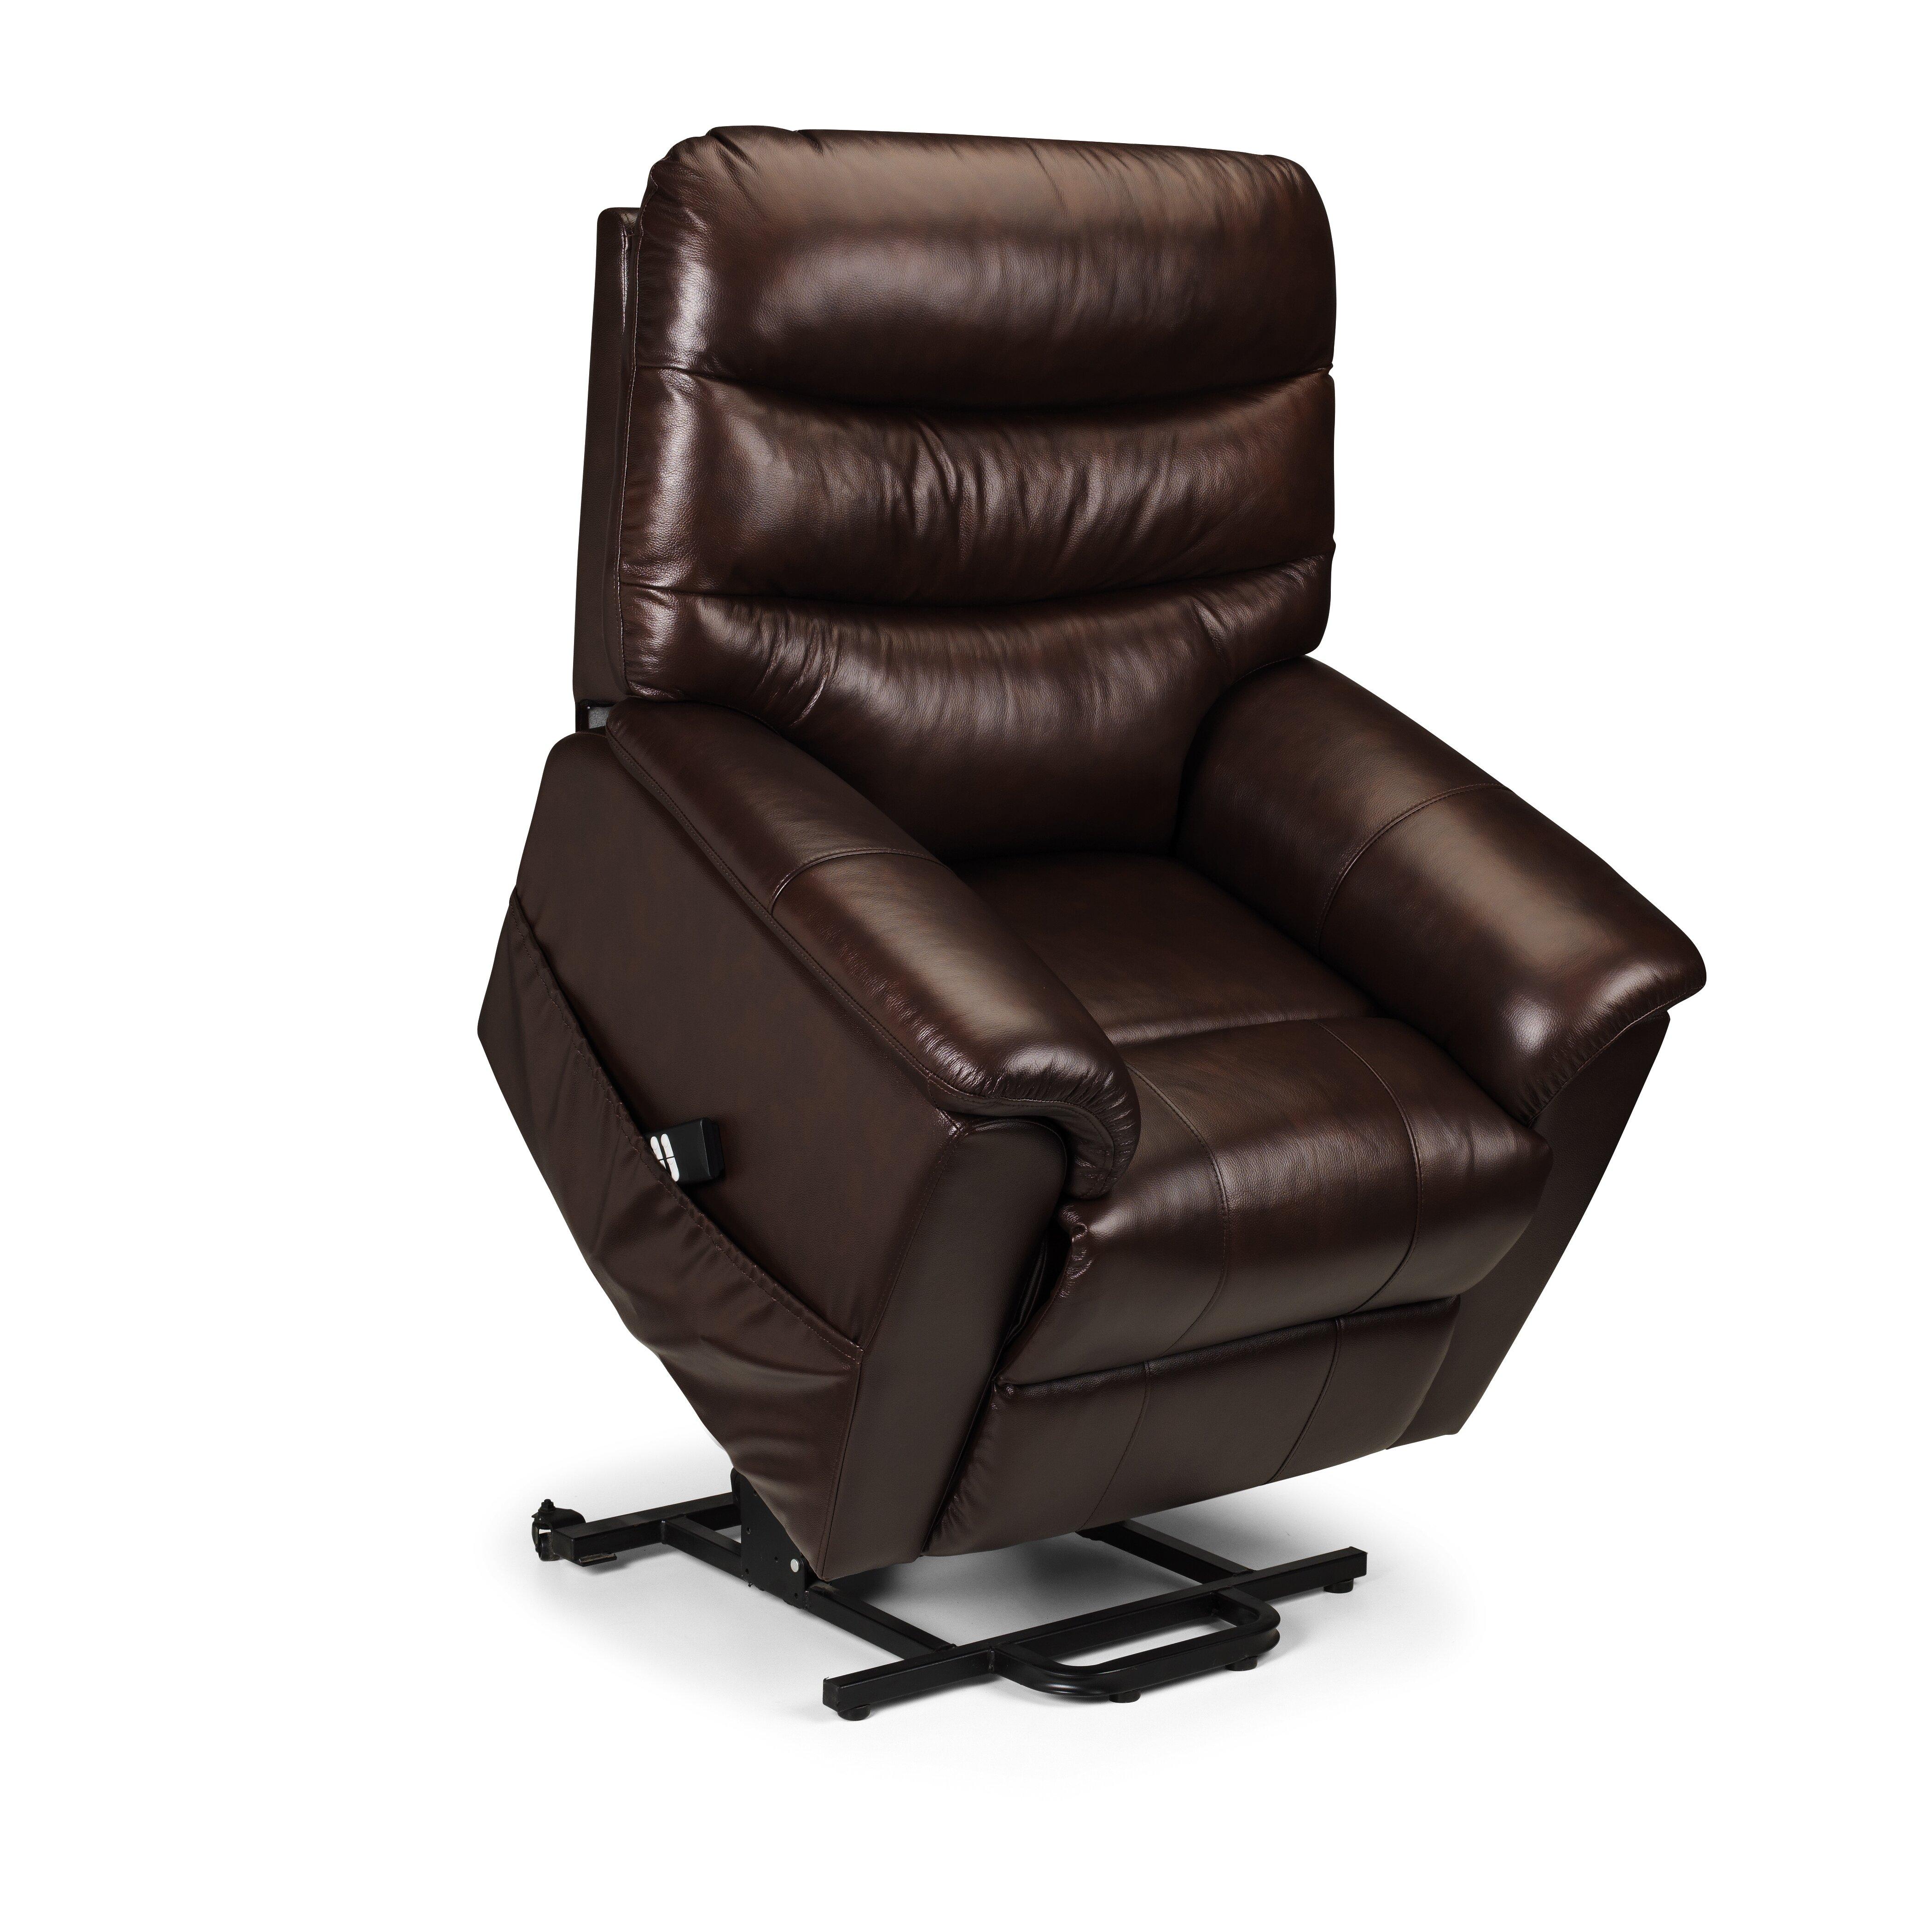 all home aberdeen leather dual motor rise recliner wayfair uk. Black Bedroom Furniture Sets. Home Design Ideas